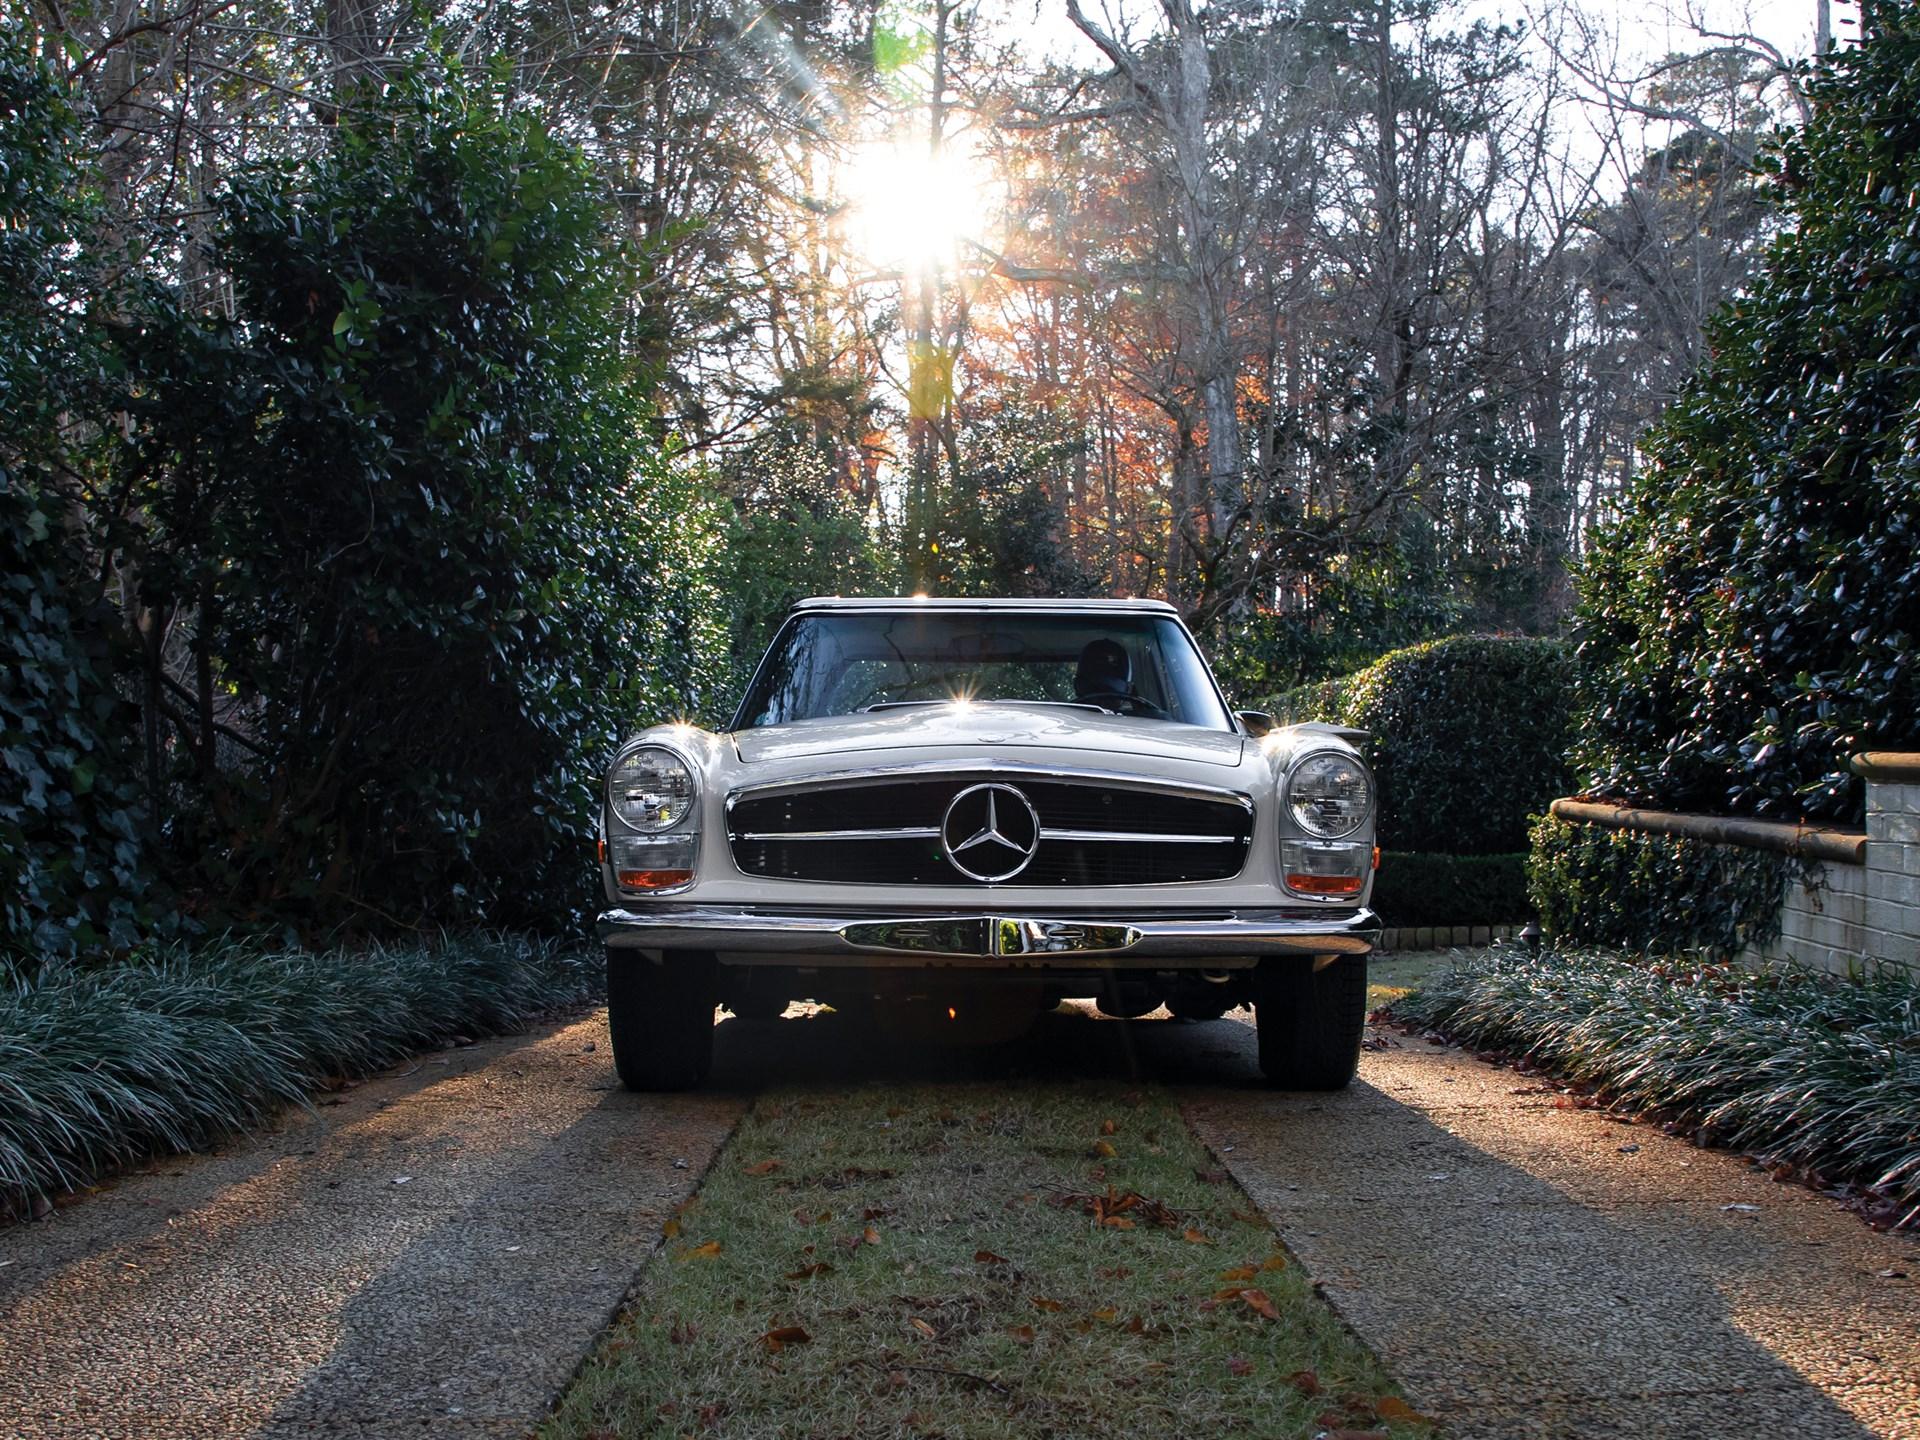 1968 Mercedes-Benz 280 SL 'Pagoda'